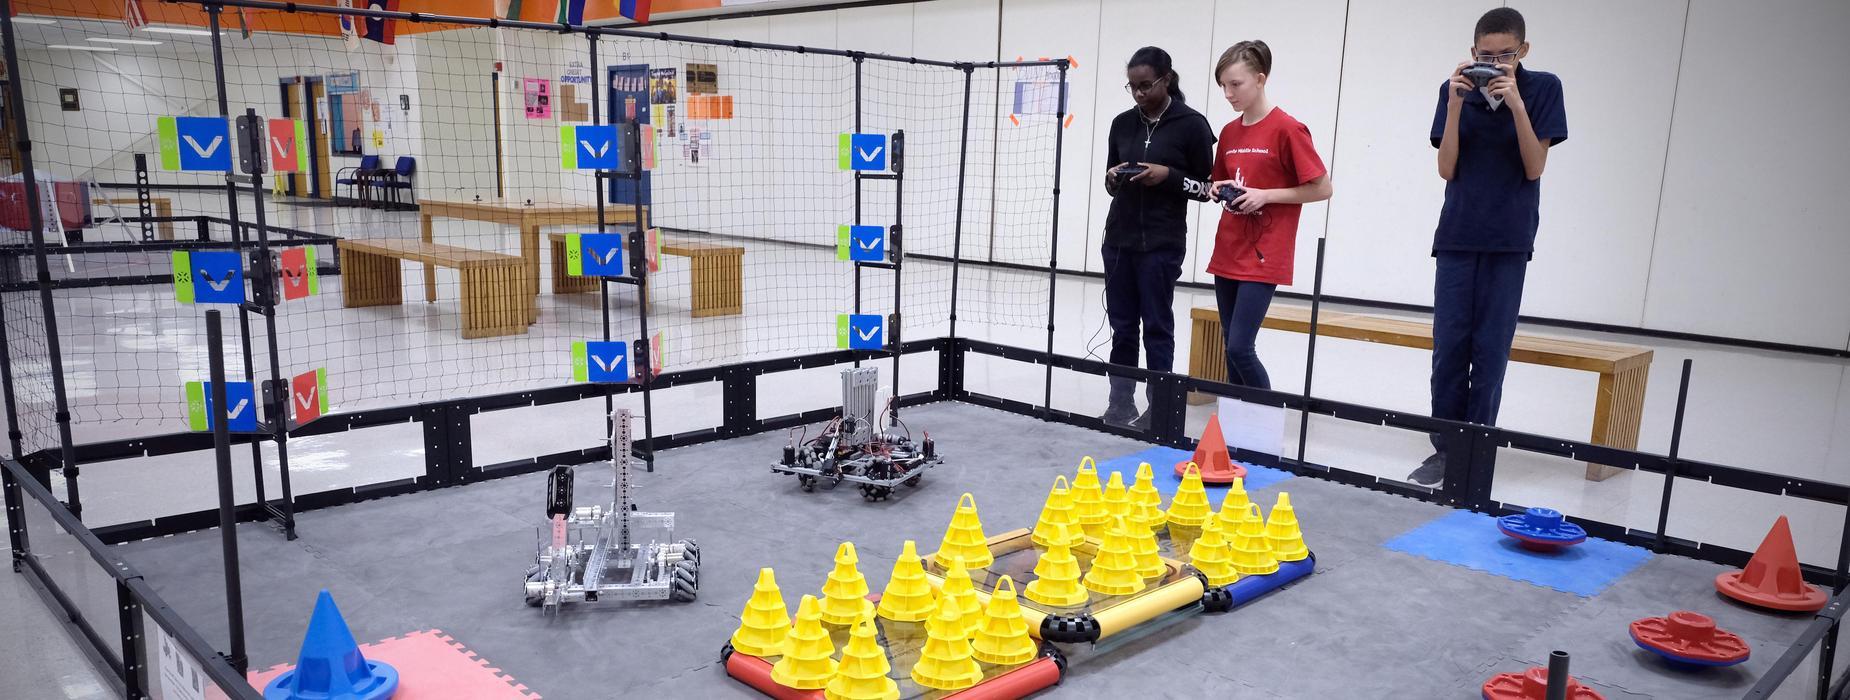 Kids participating in a robotics event